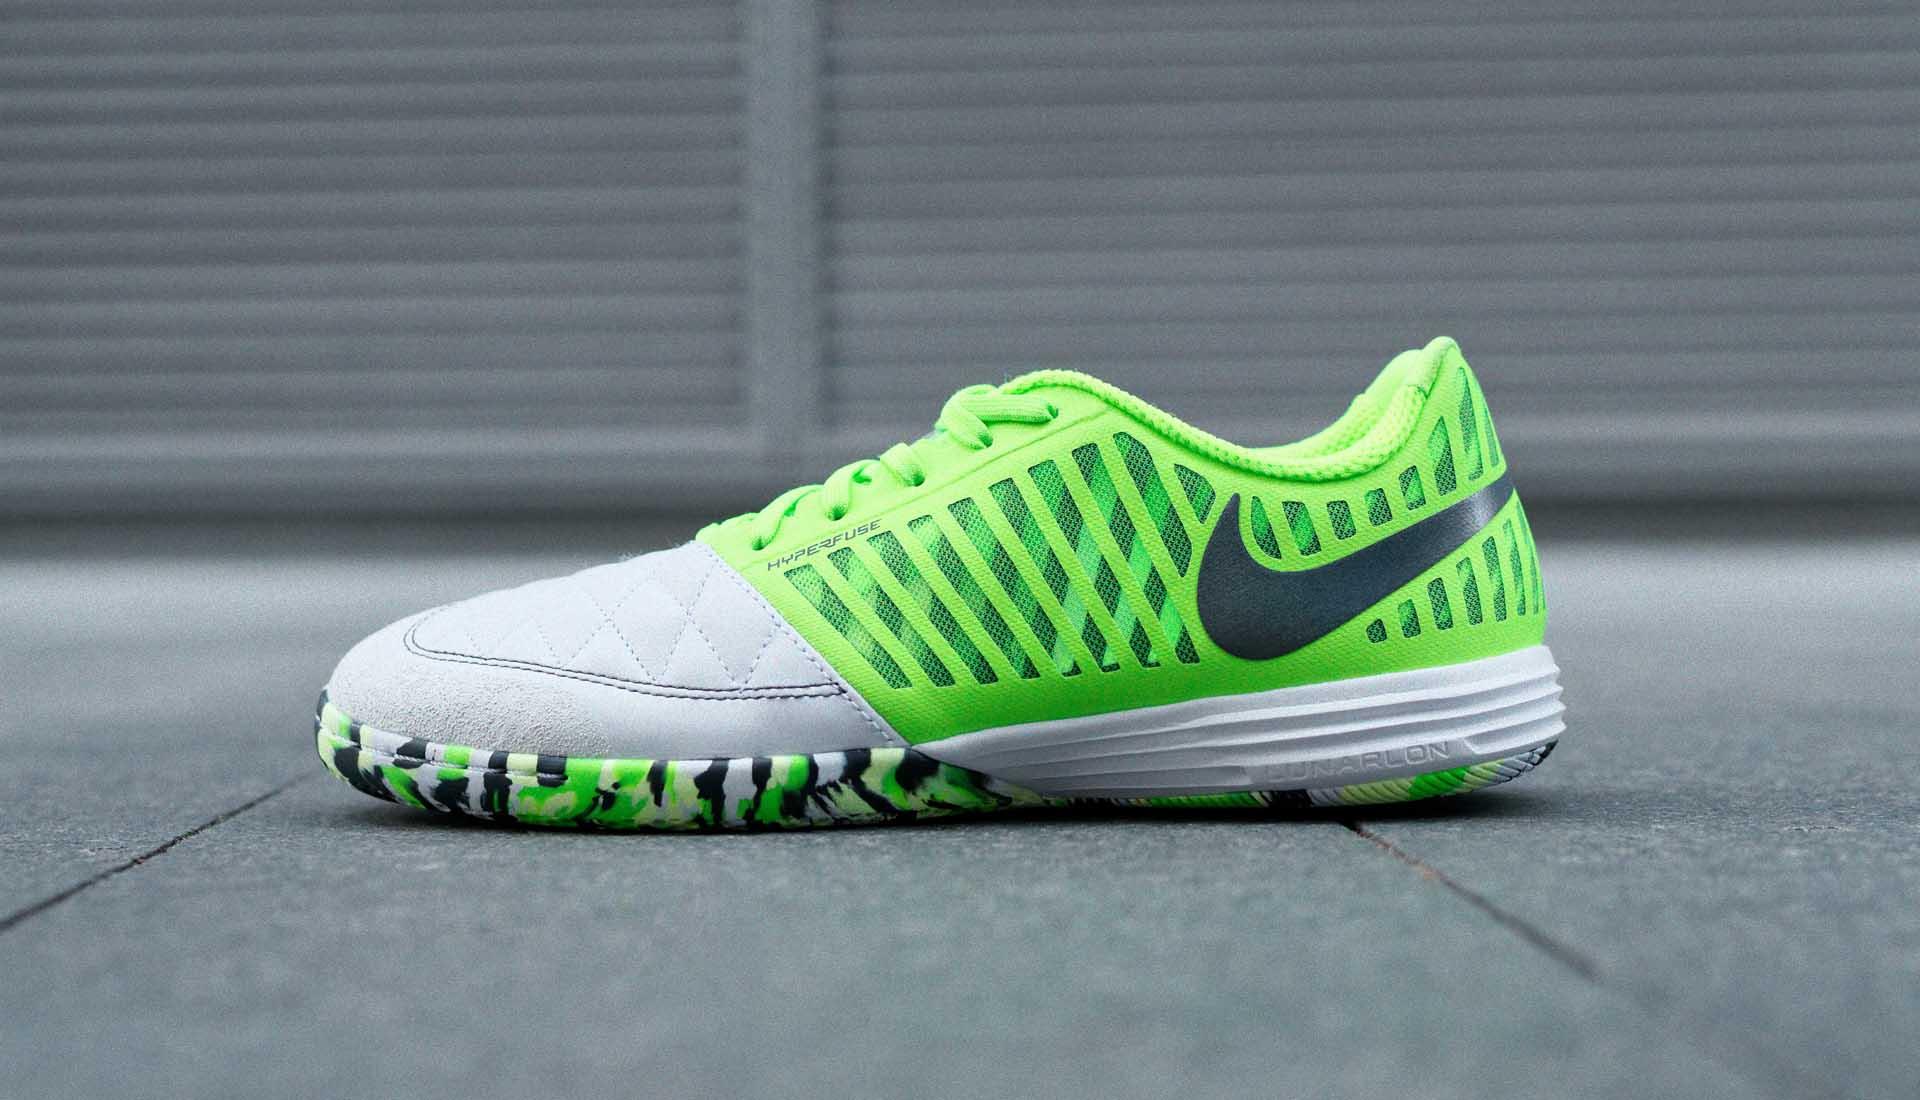 Catástrofe granizo Credo  Nike Launch Two LunarGato II Colourways For AW19 - SoccerBible